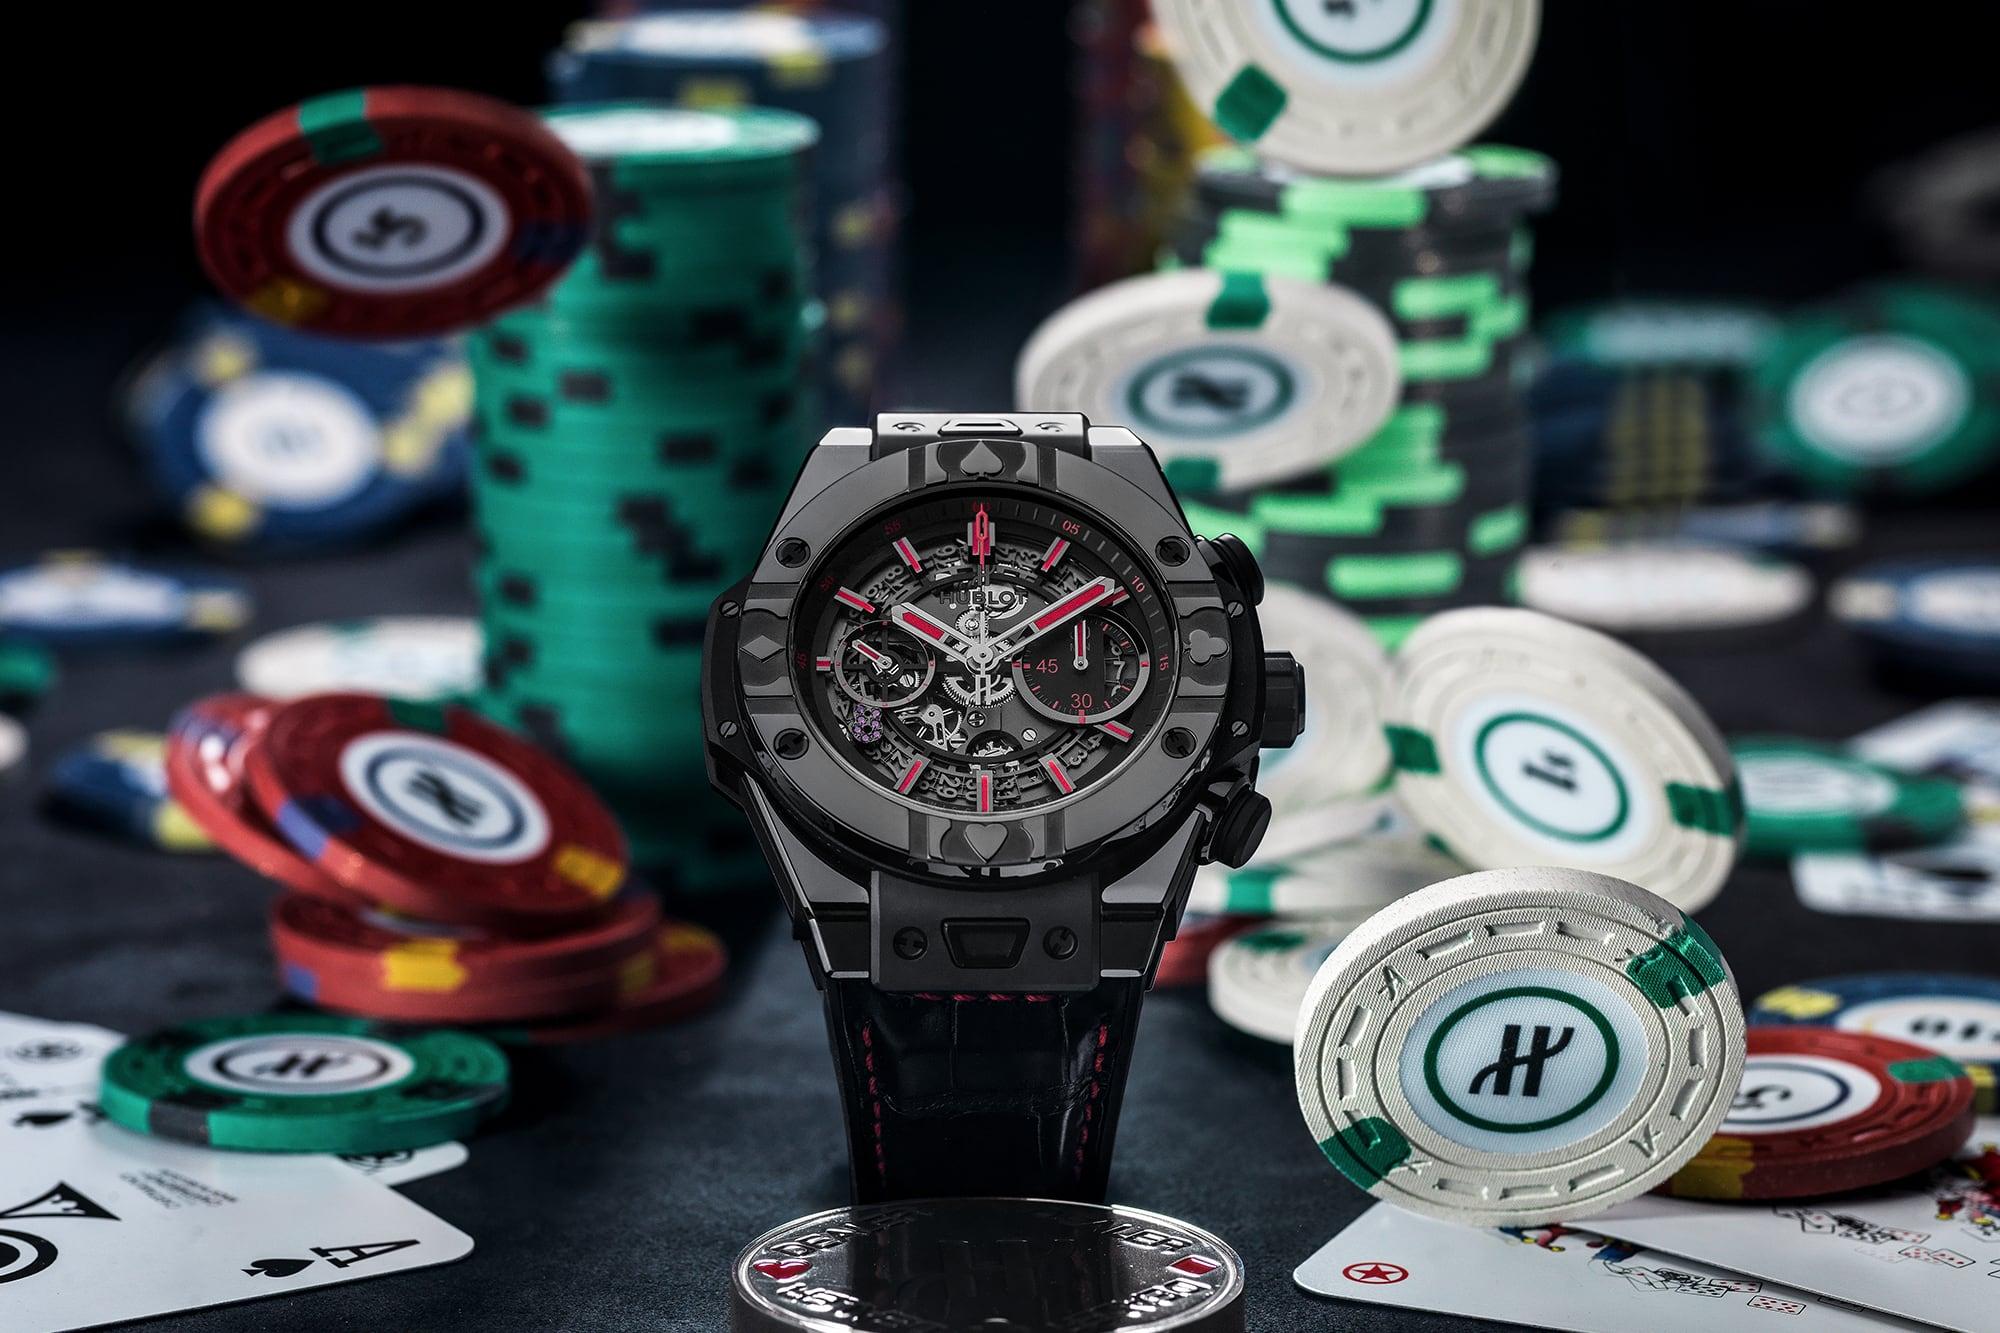 Hublot Big Bang Unico World Poker Tour Limited Edition featured